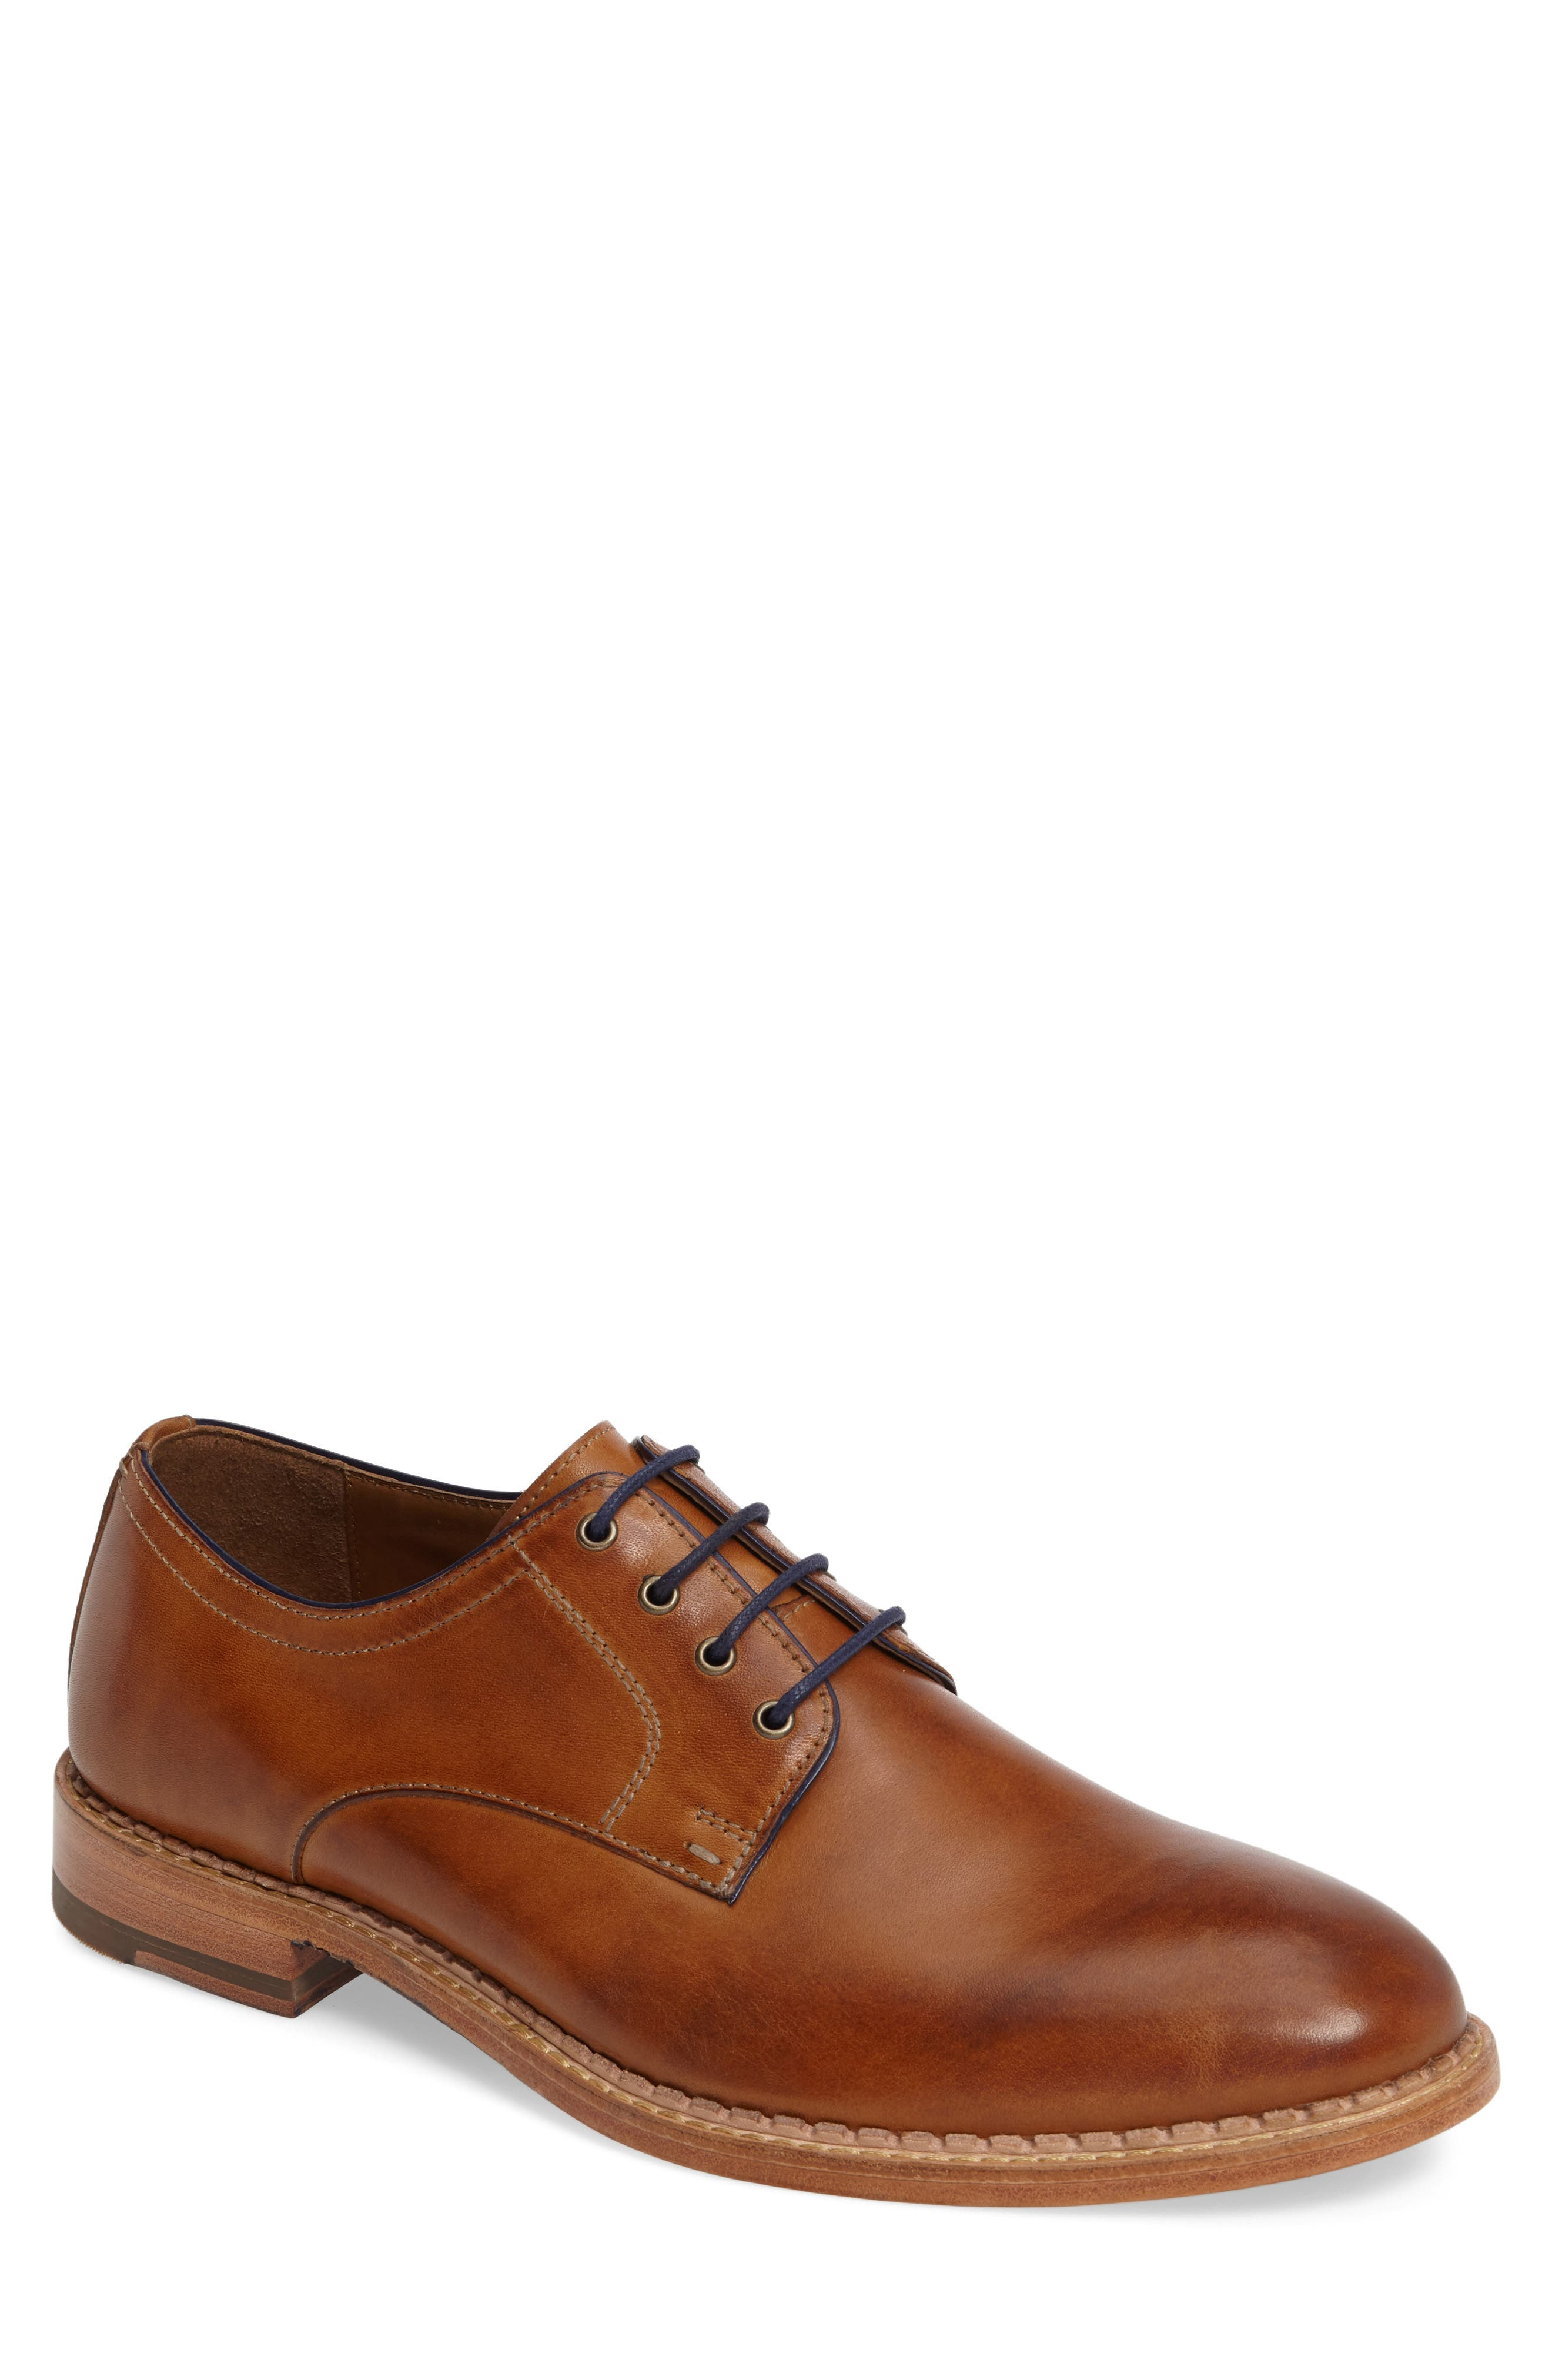 Chambliss Plain Toe Derby,                         Main,                         color, Tan Calfskin